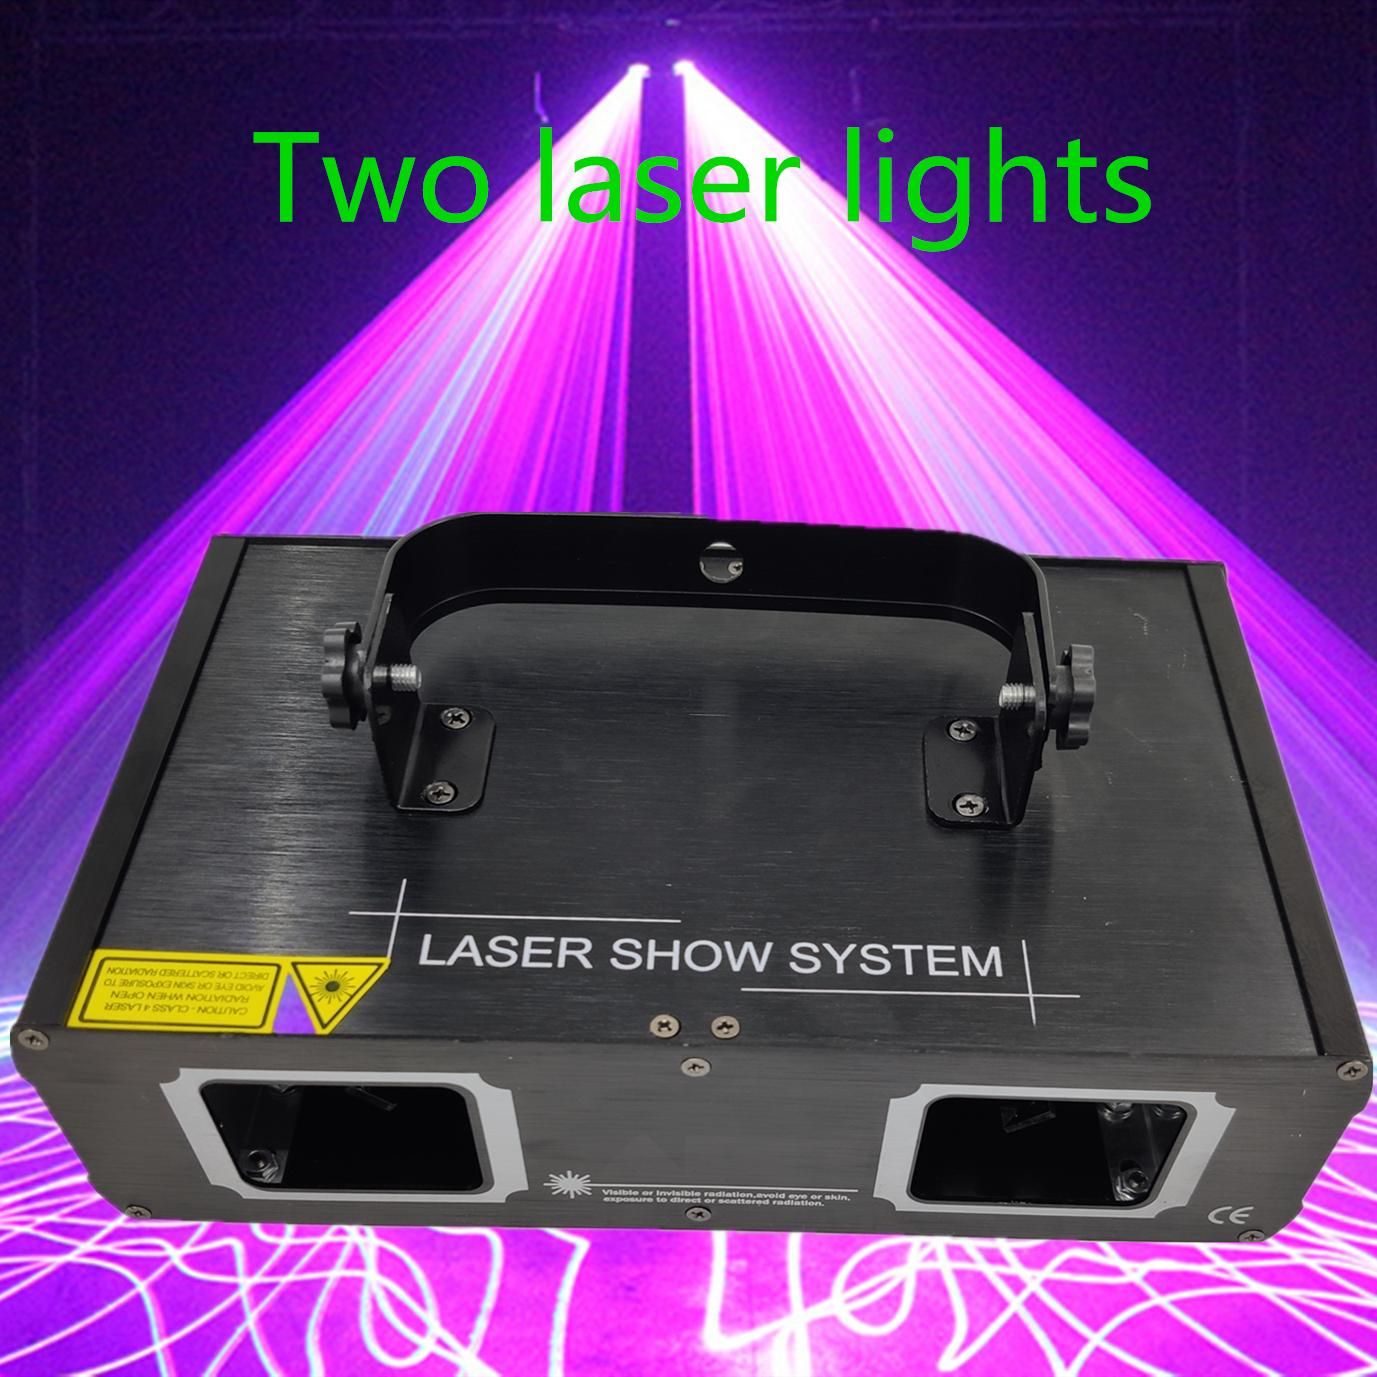 Lámpara láser de salida de fábrica 2 cabezales láser efecto de doble agujero etapa DMX512 iluminación para DJ discoteca fiesta KTV club nocturno y pista de baile Led Medusa luz de noche hogar Decoración de acuario lámpara de noche creativa atmósfera luces moda profesional hermosa